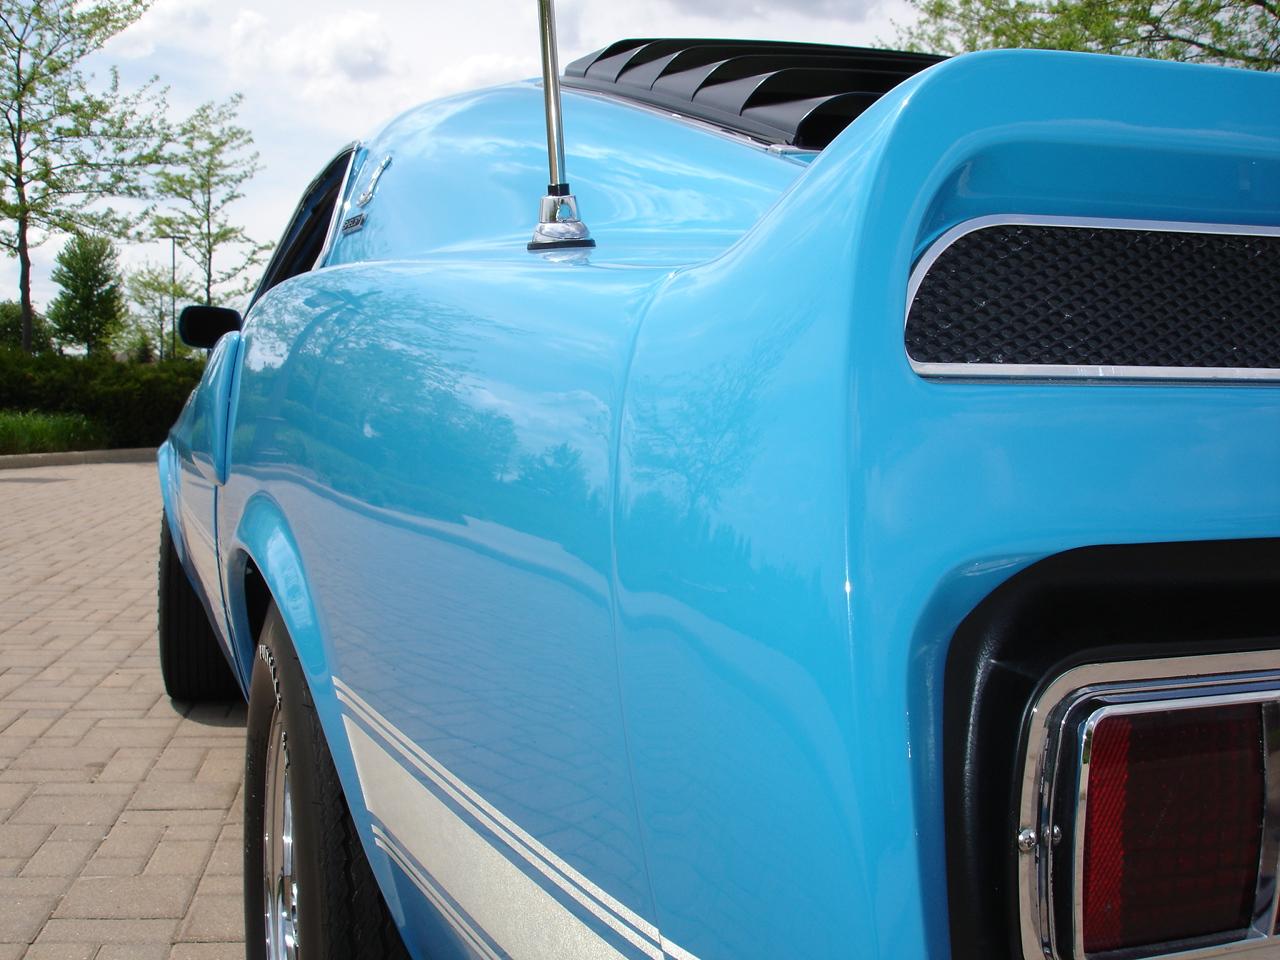 /1969-shelby-gt500-scj-drag-pack-grabber-blue